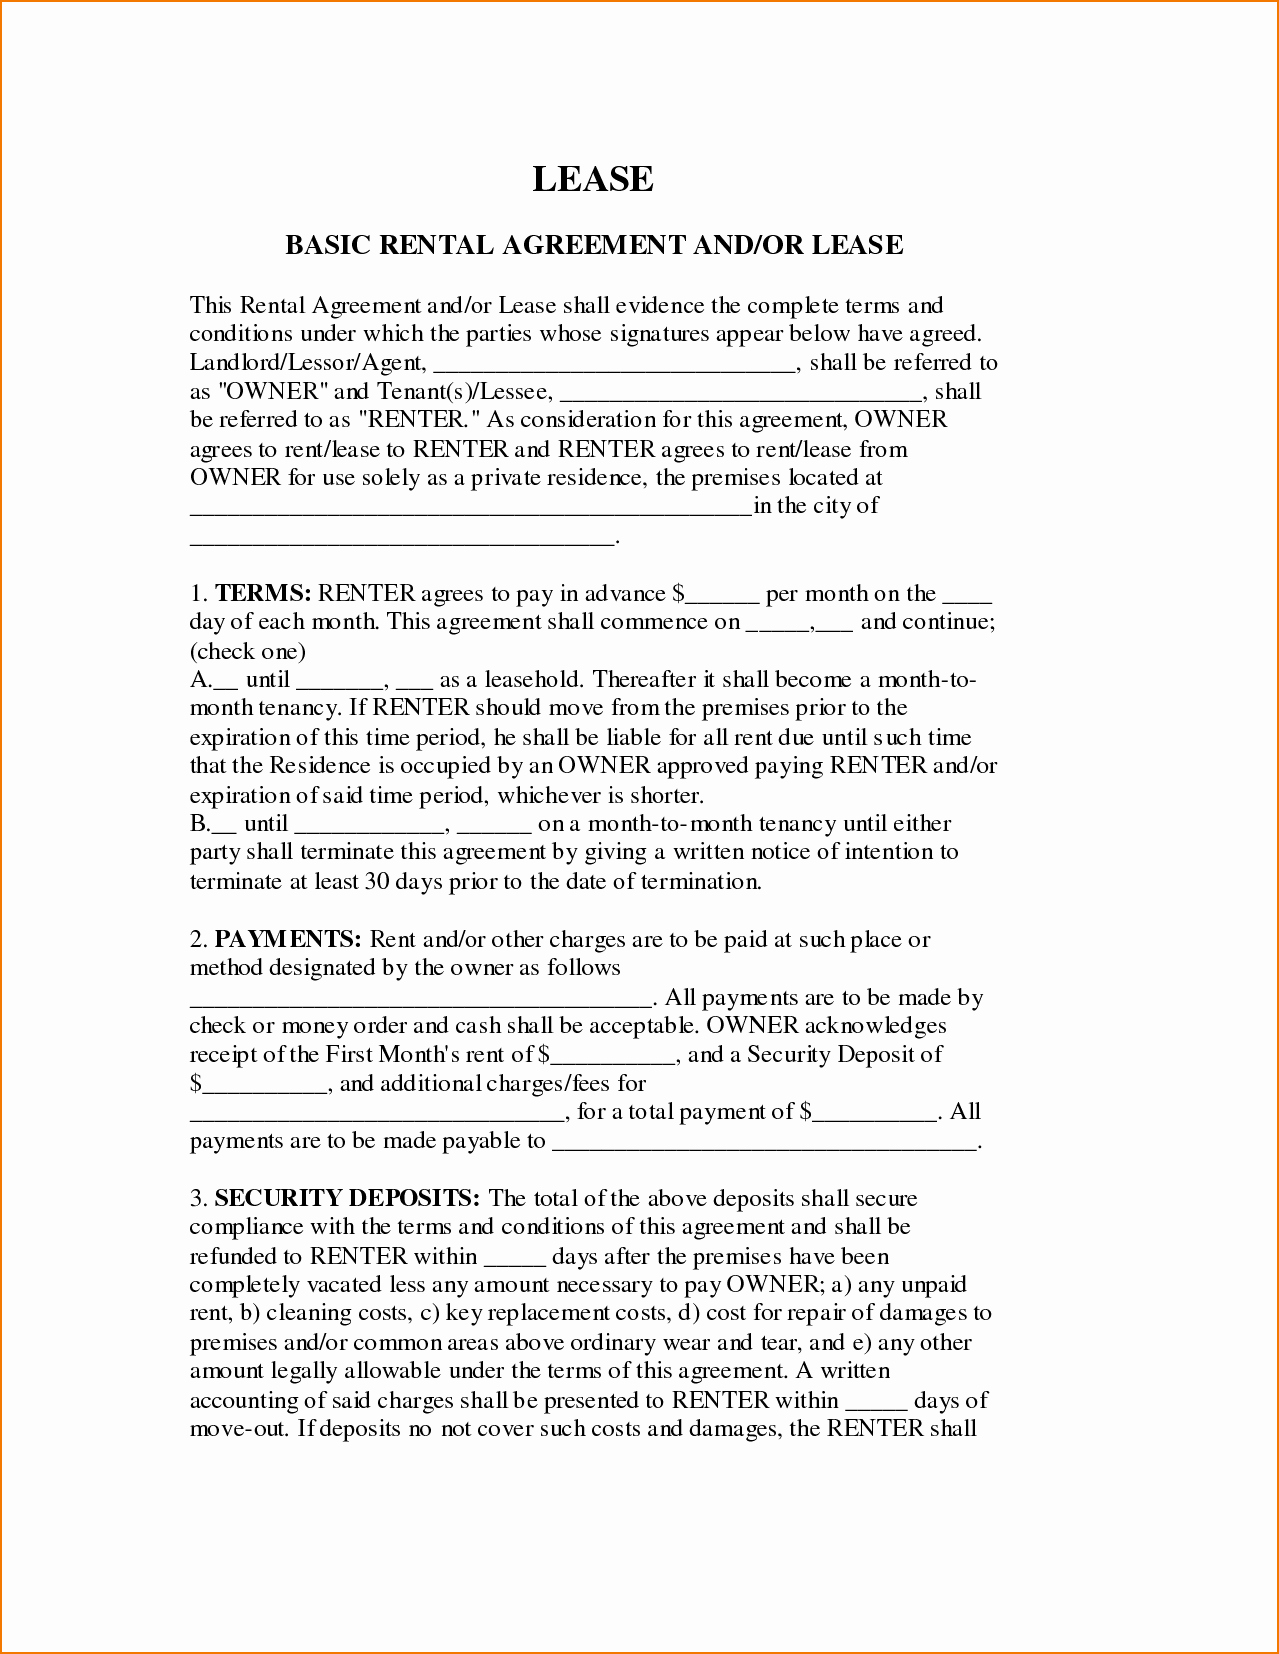 Basic Lease Agreement Template Elegant 6 Basic Lease Agreement